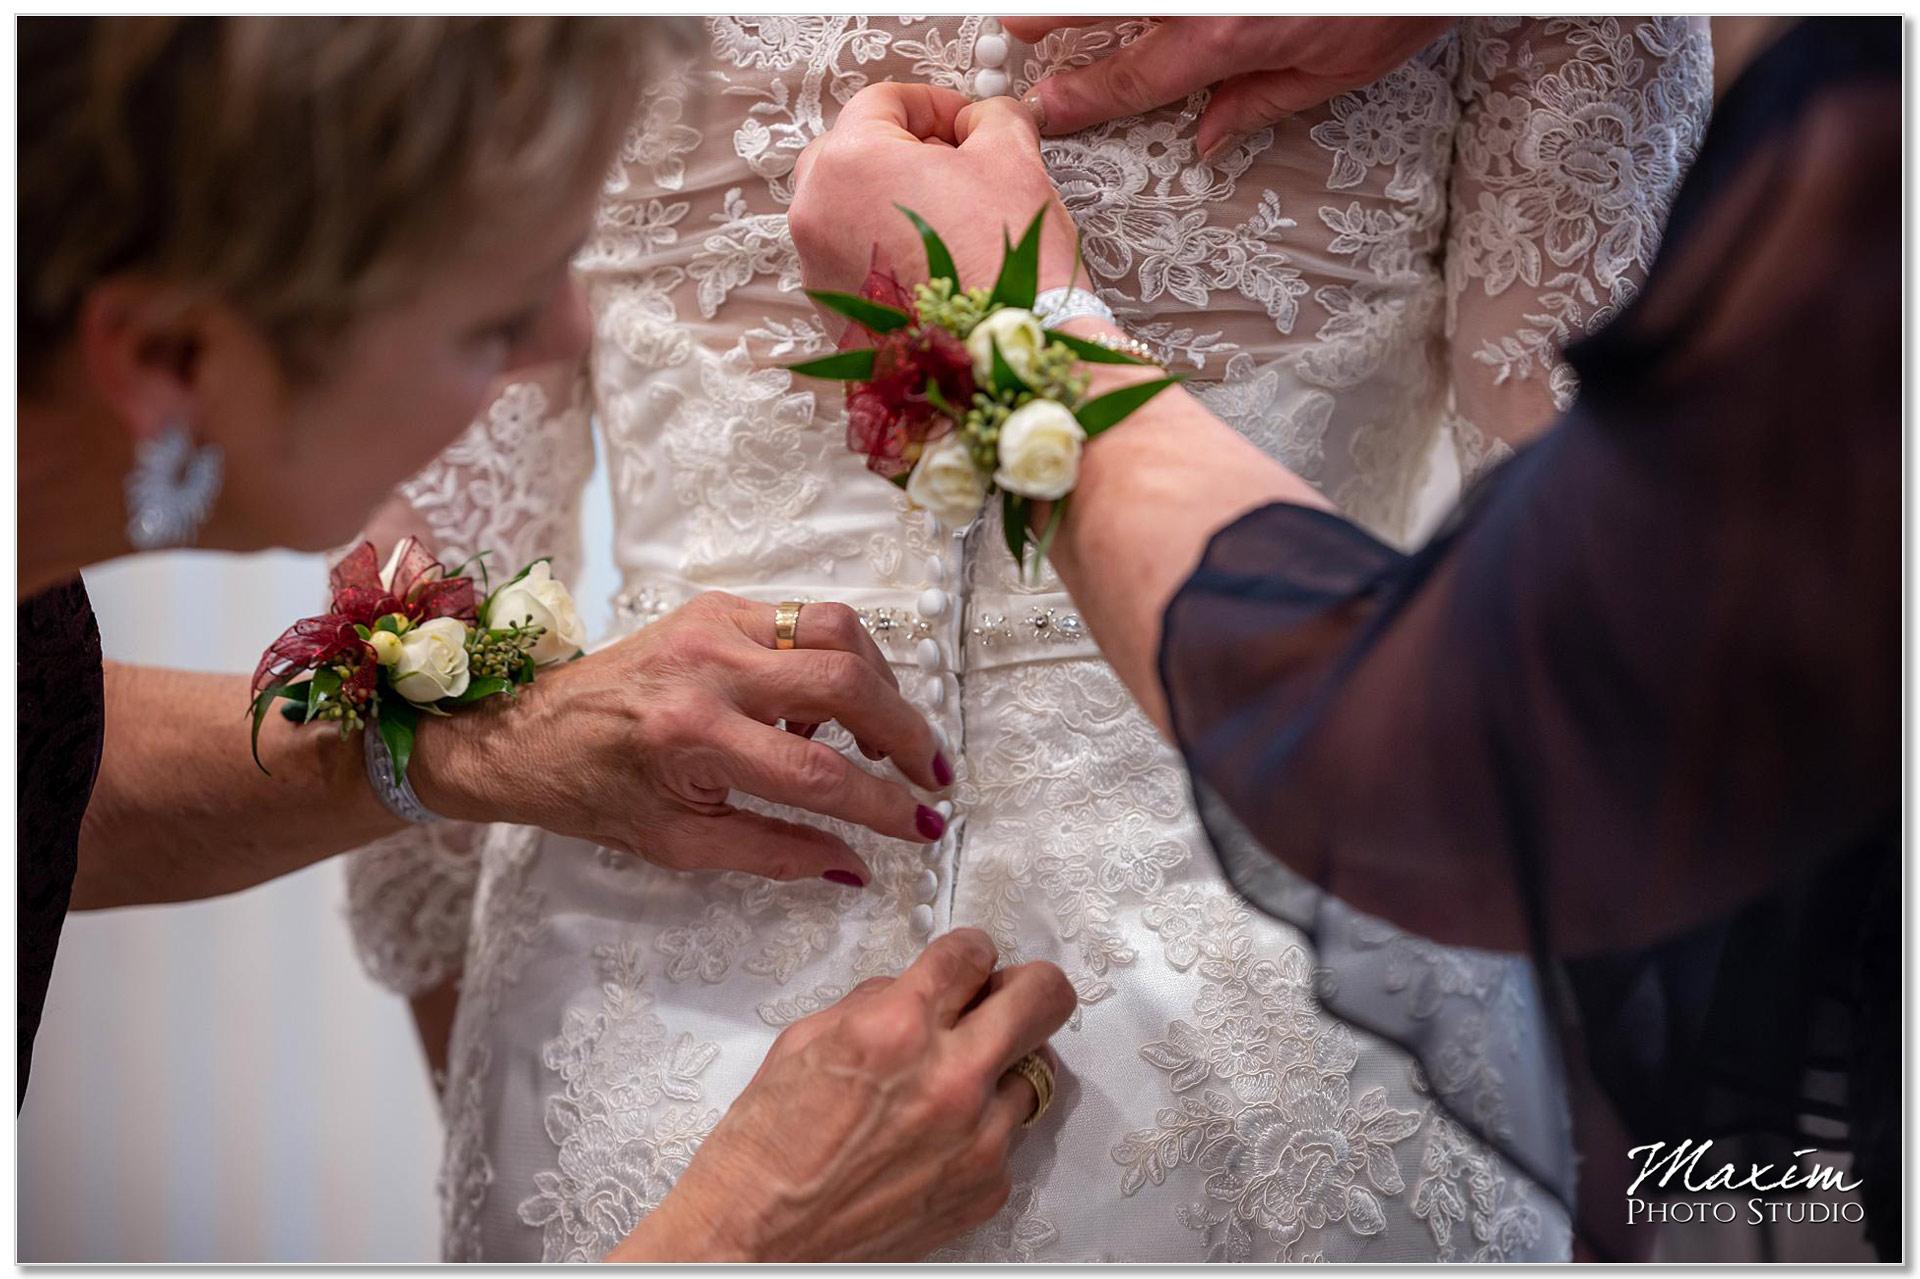 Transept Bridal dress preparations